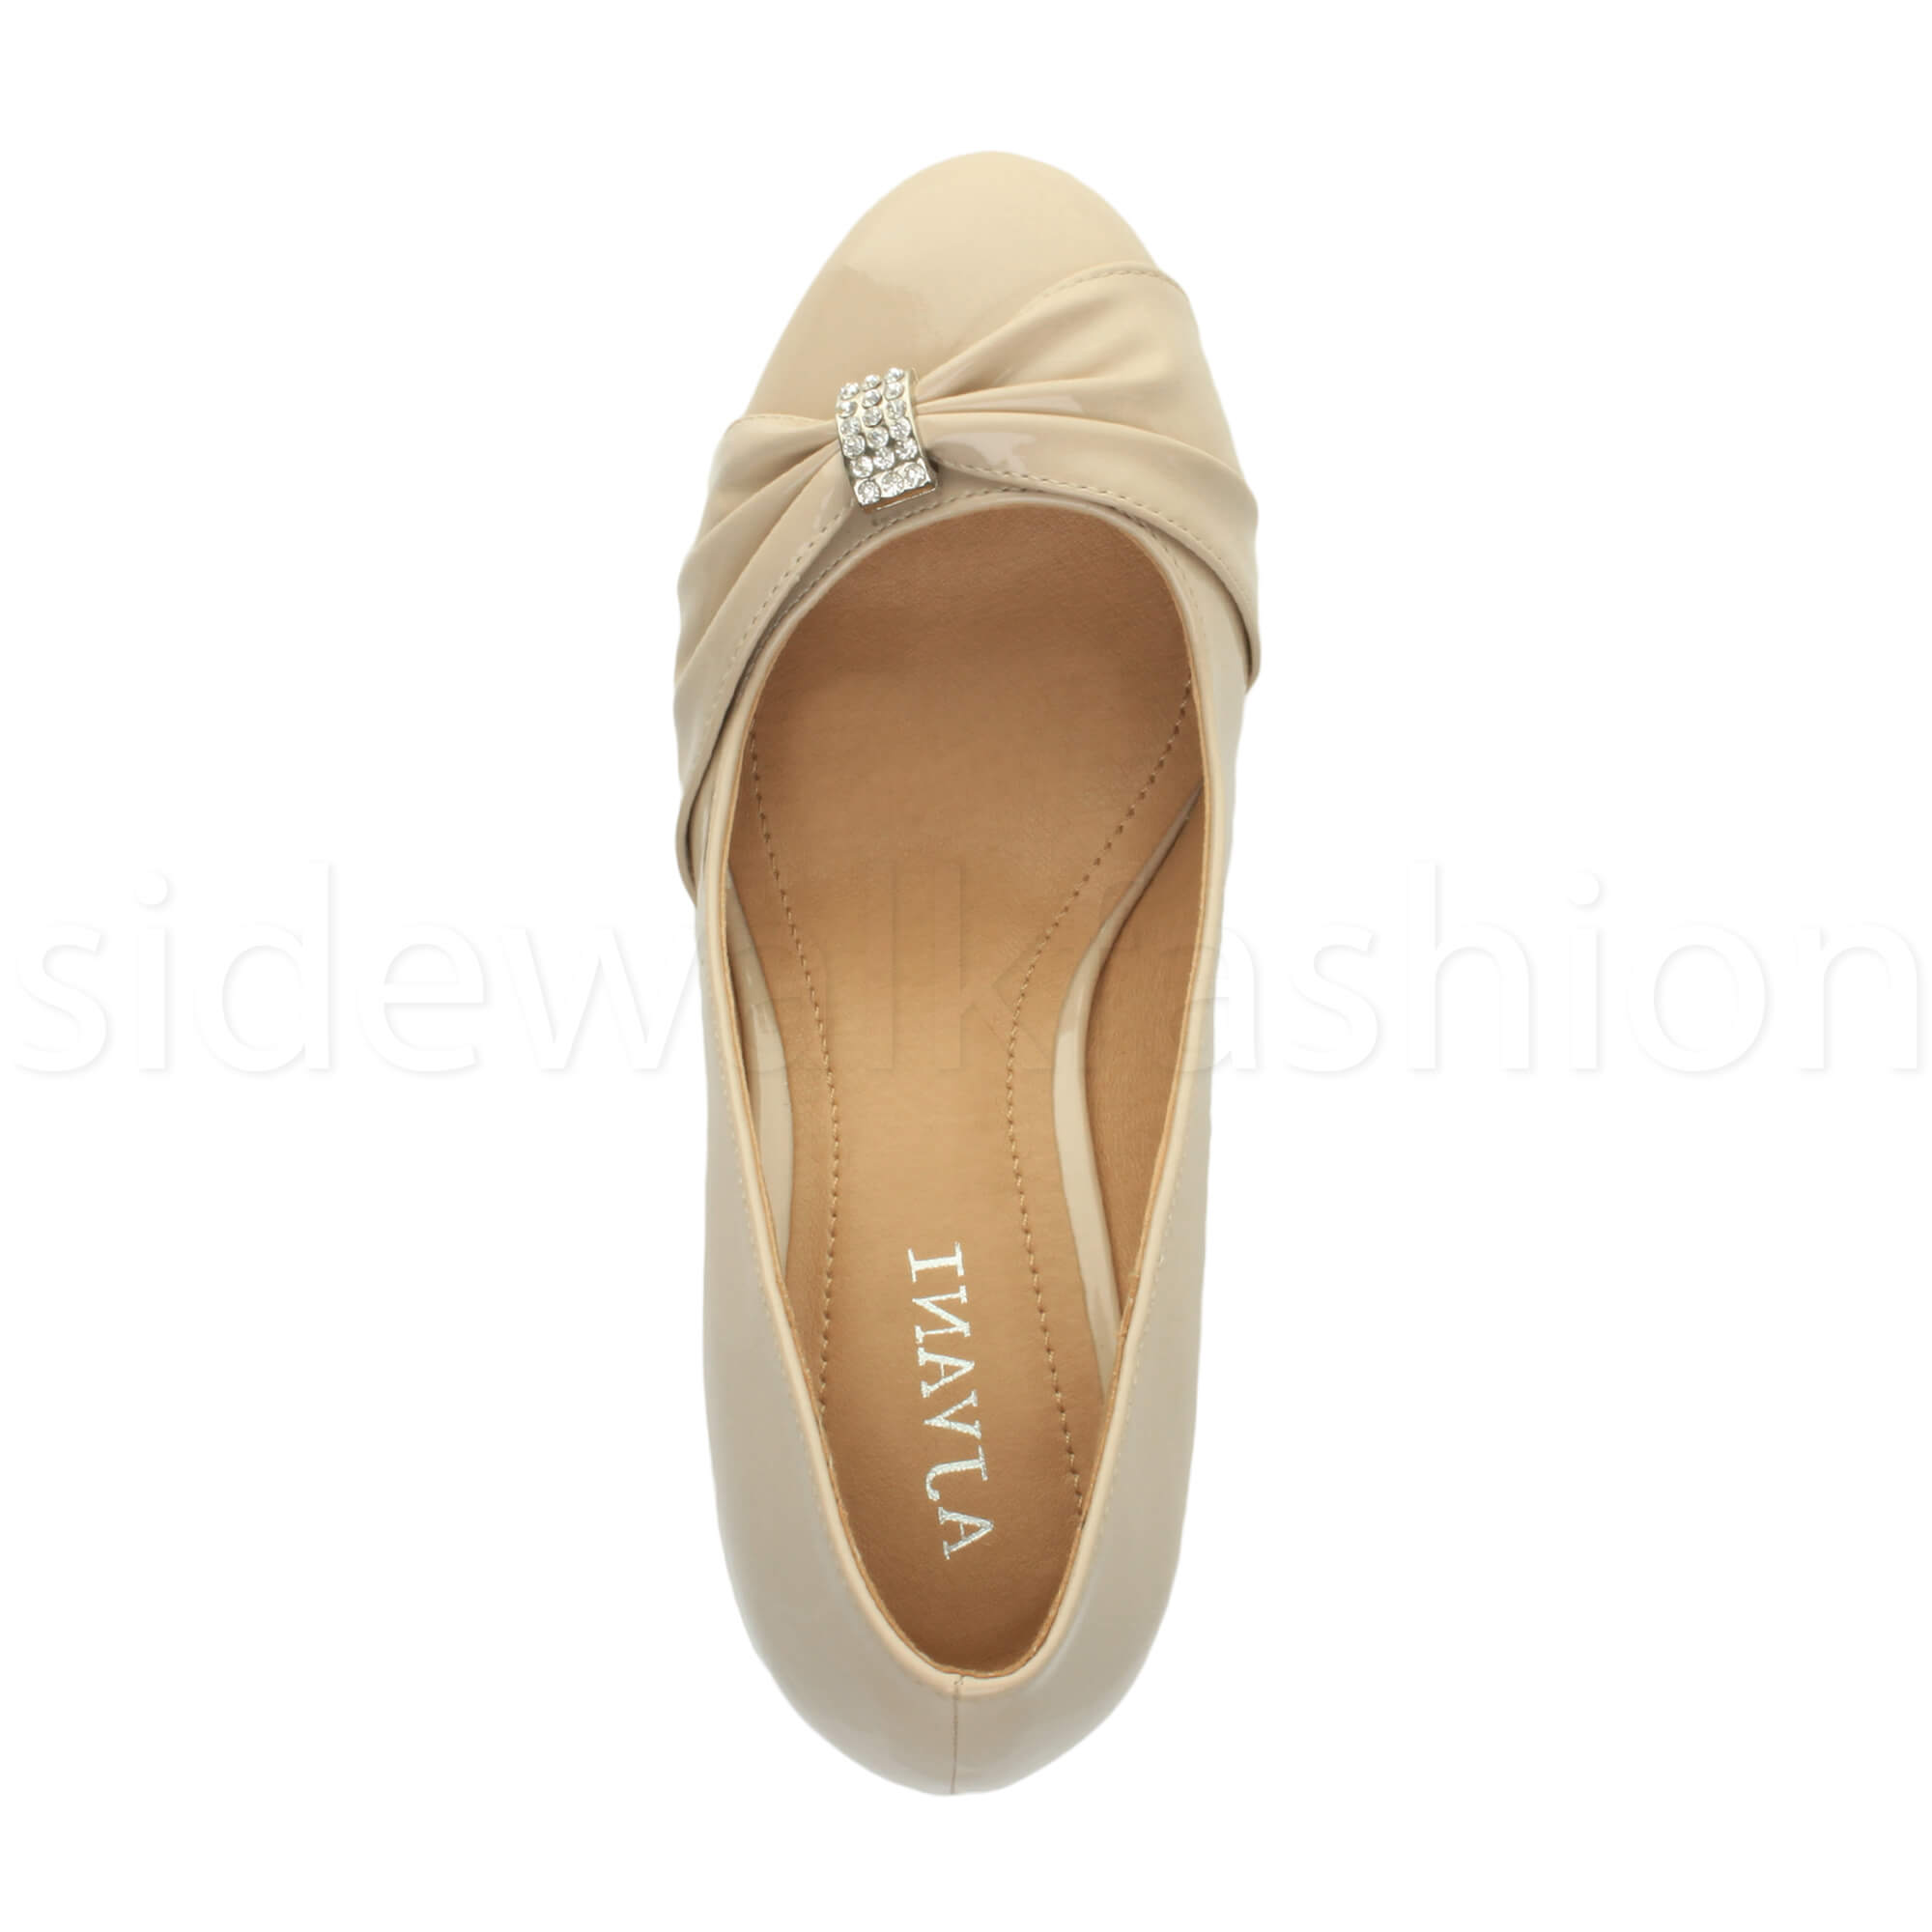 Womens-ladies-low-mid-heel-diamante-party-smart-evening-court-shoes-size thumbnail 72